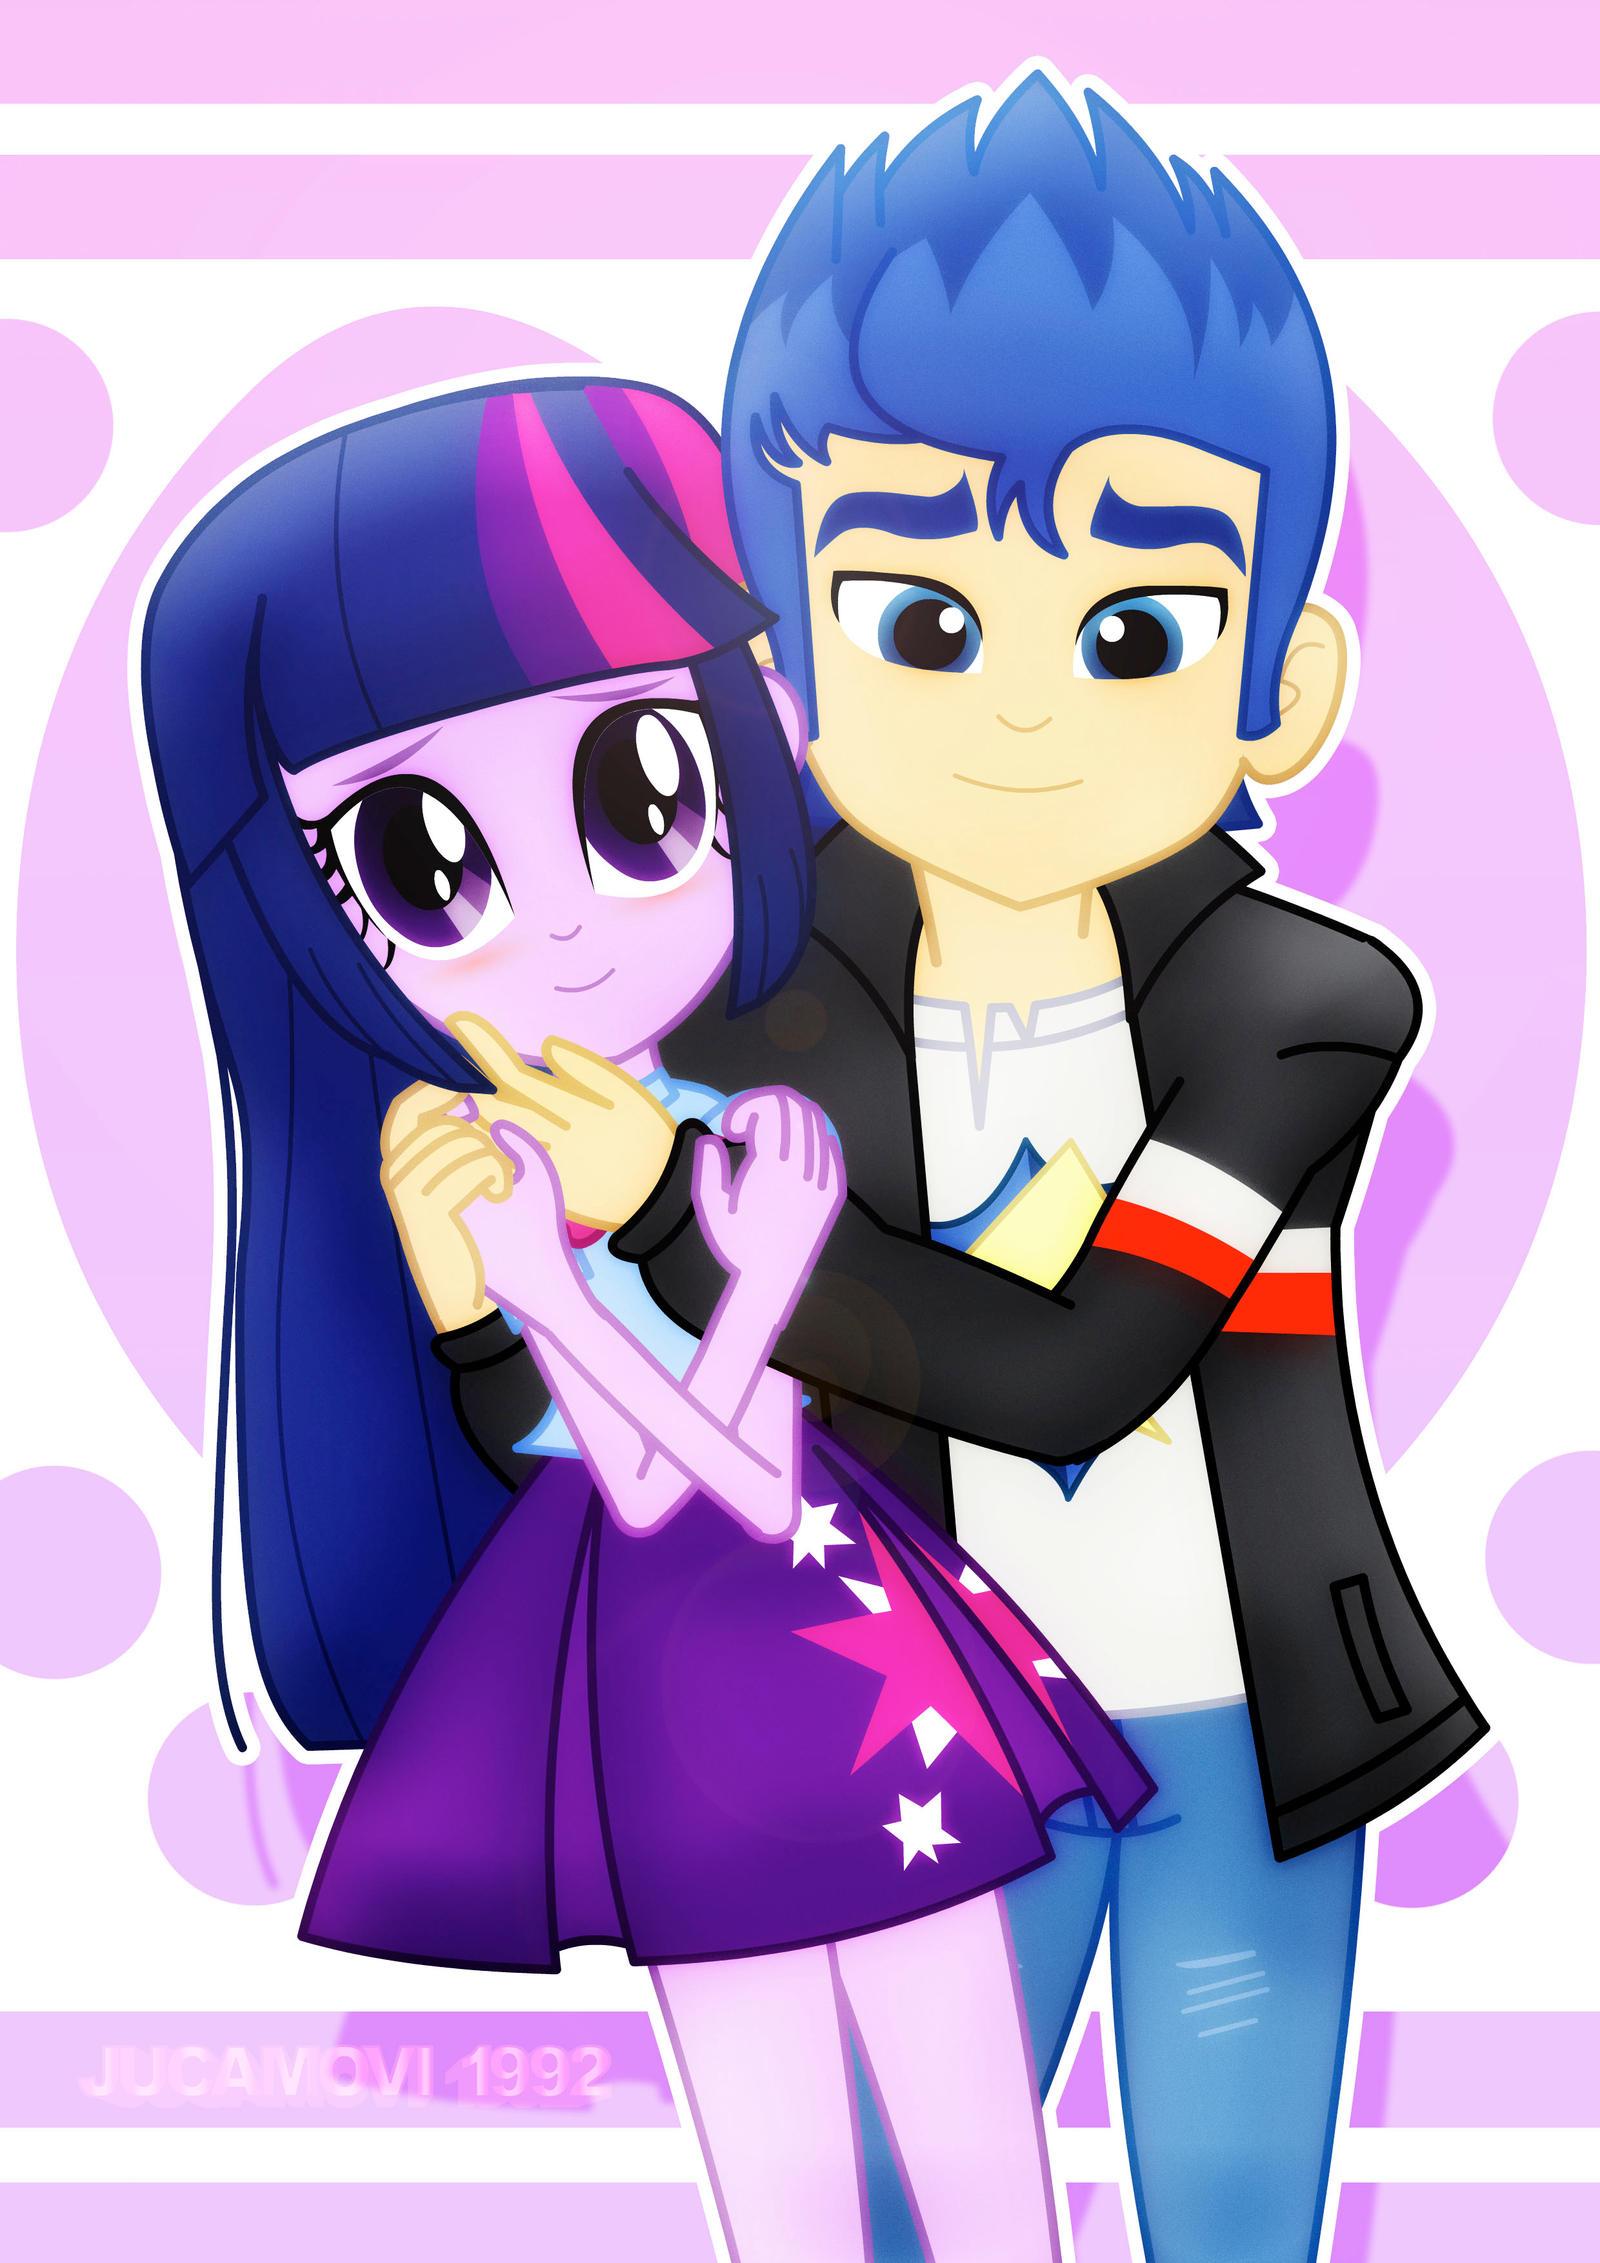 Flash_Twilight_Valentine's hug. by jucamovi1992 on DeviantArt